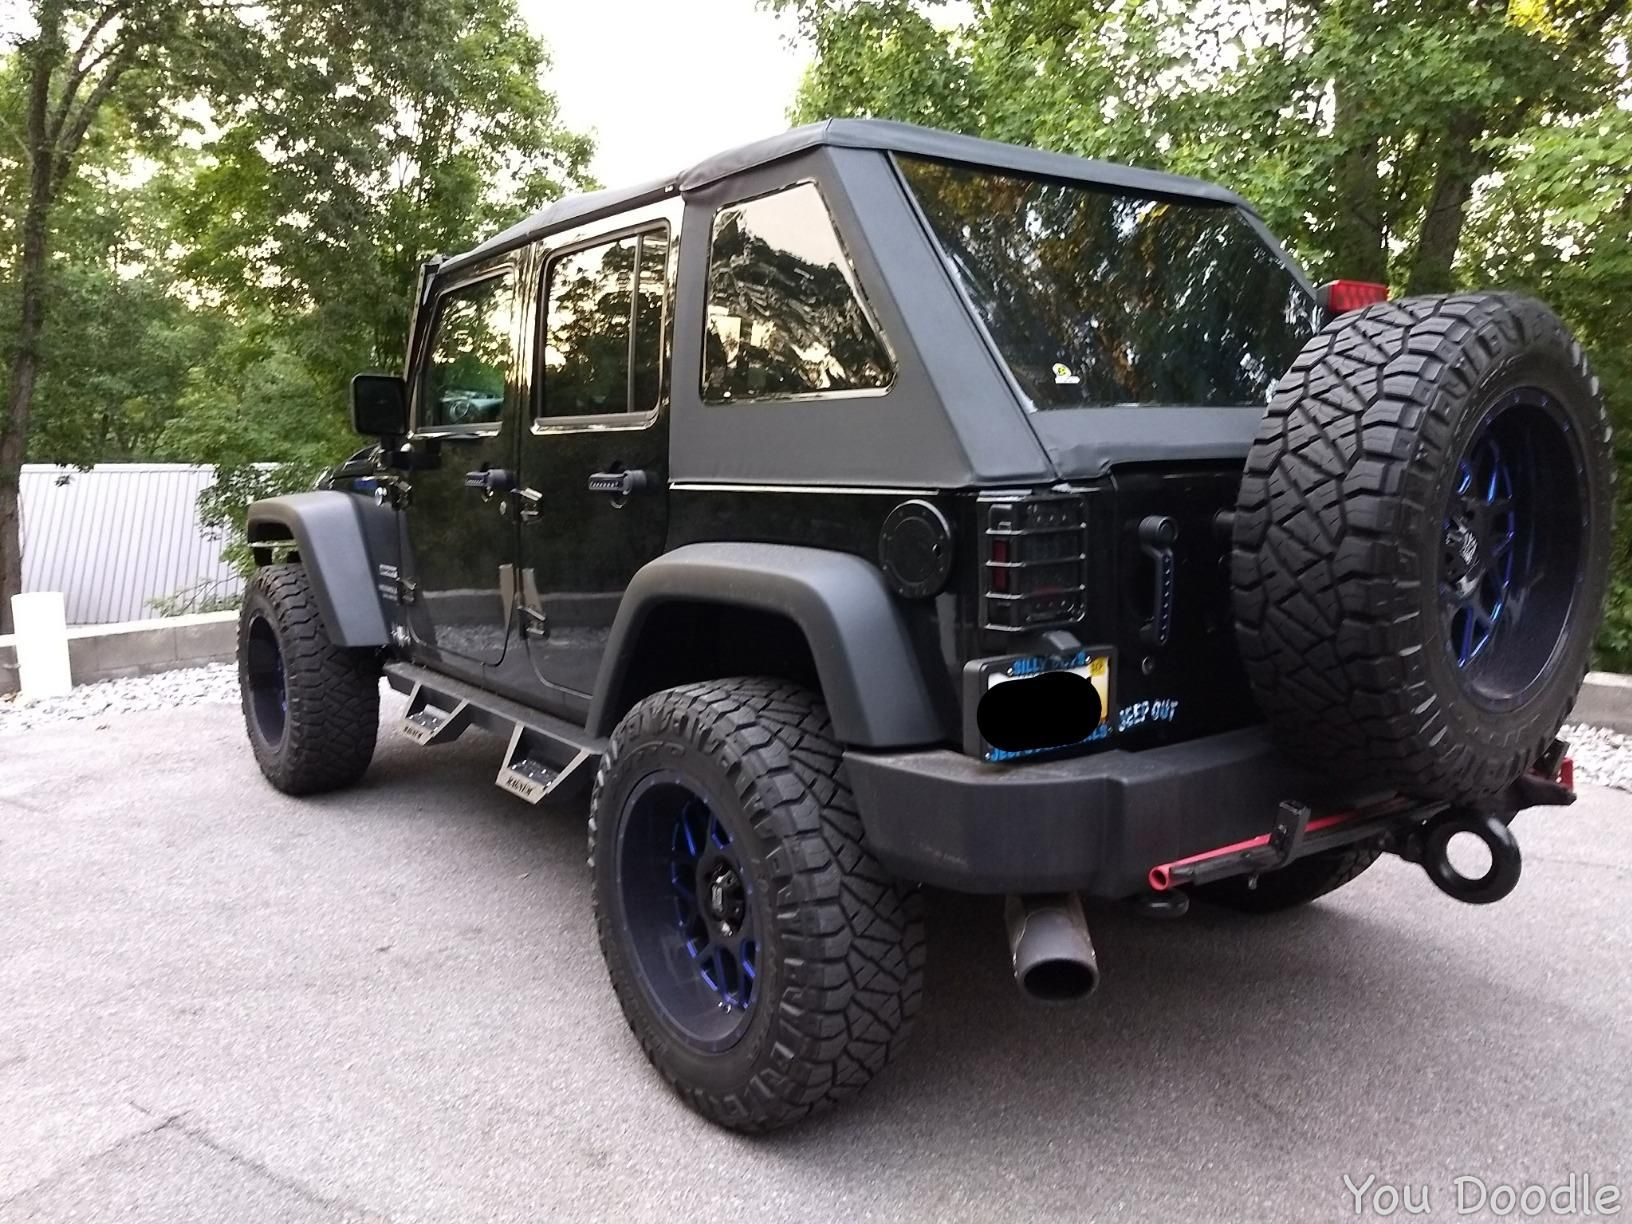 Jeep Wrangler Jku Trektop Soft Top In 2020 Jeep Wrangler Soft Top Jeep Wrangler Doors Black Jeep Wrangler